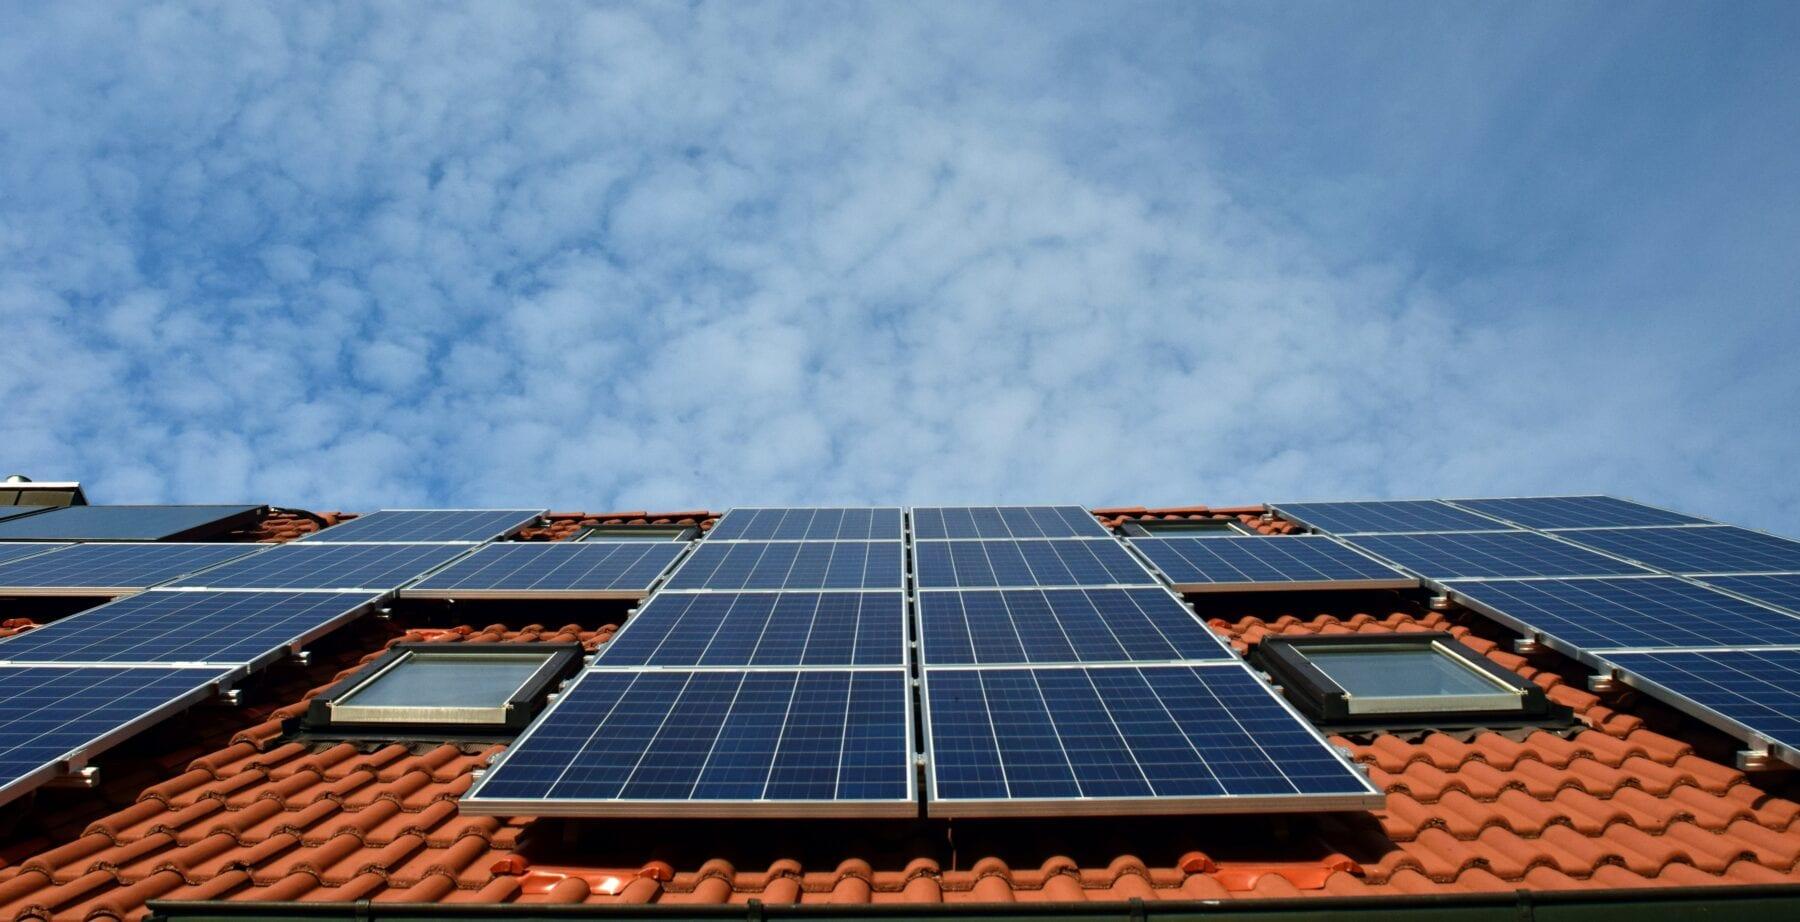 solar panel patio covers